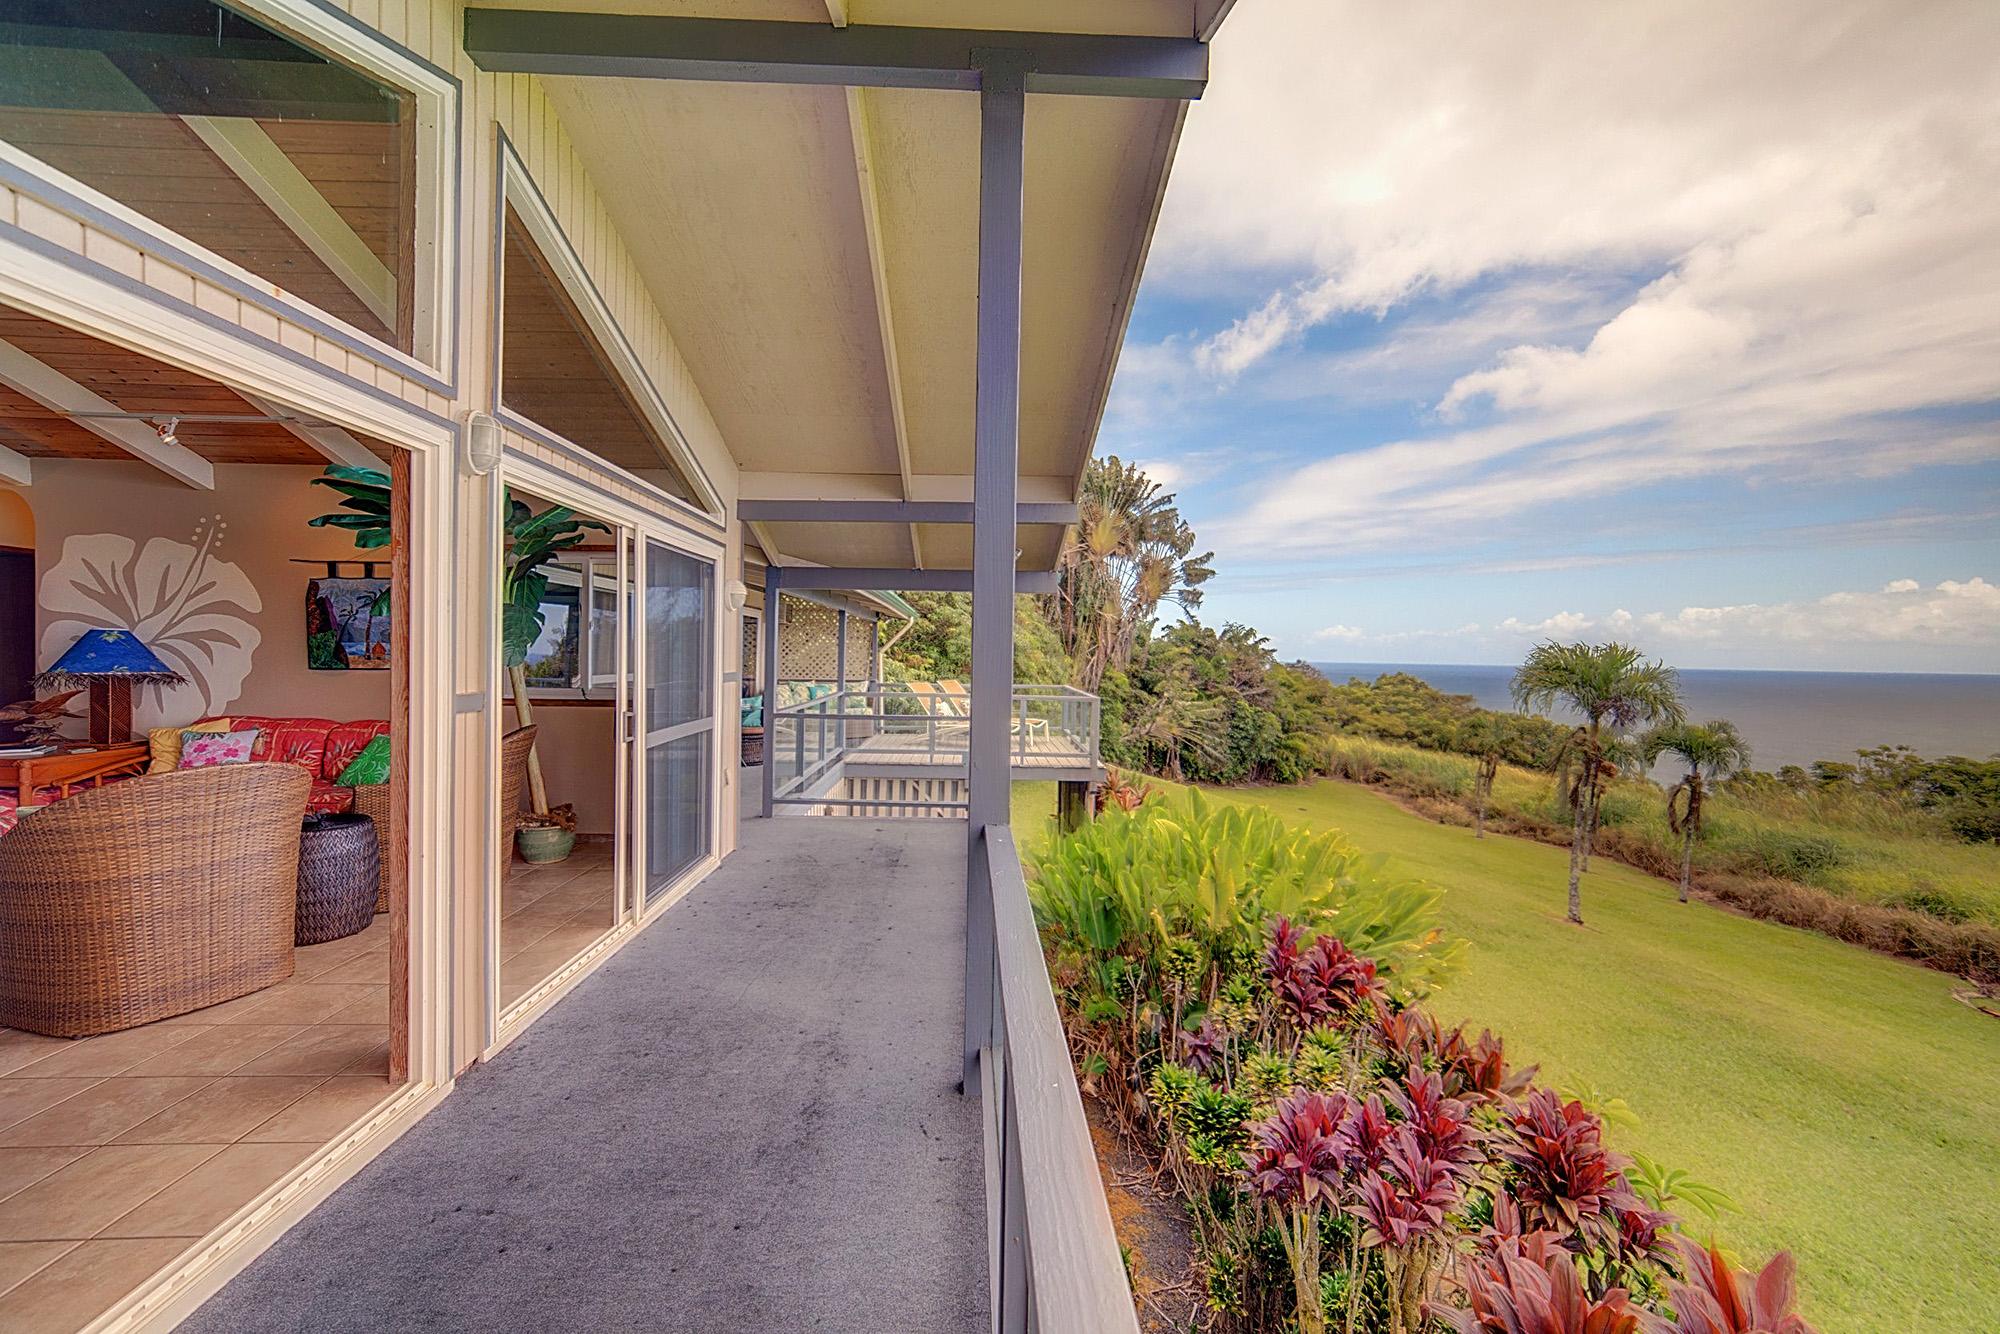 Hawaii Vacation Rental Home, Big island ocean view rental